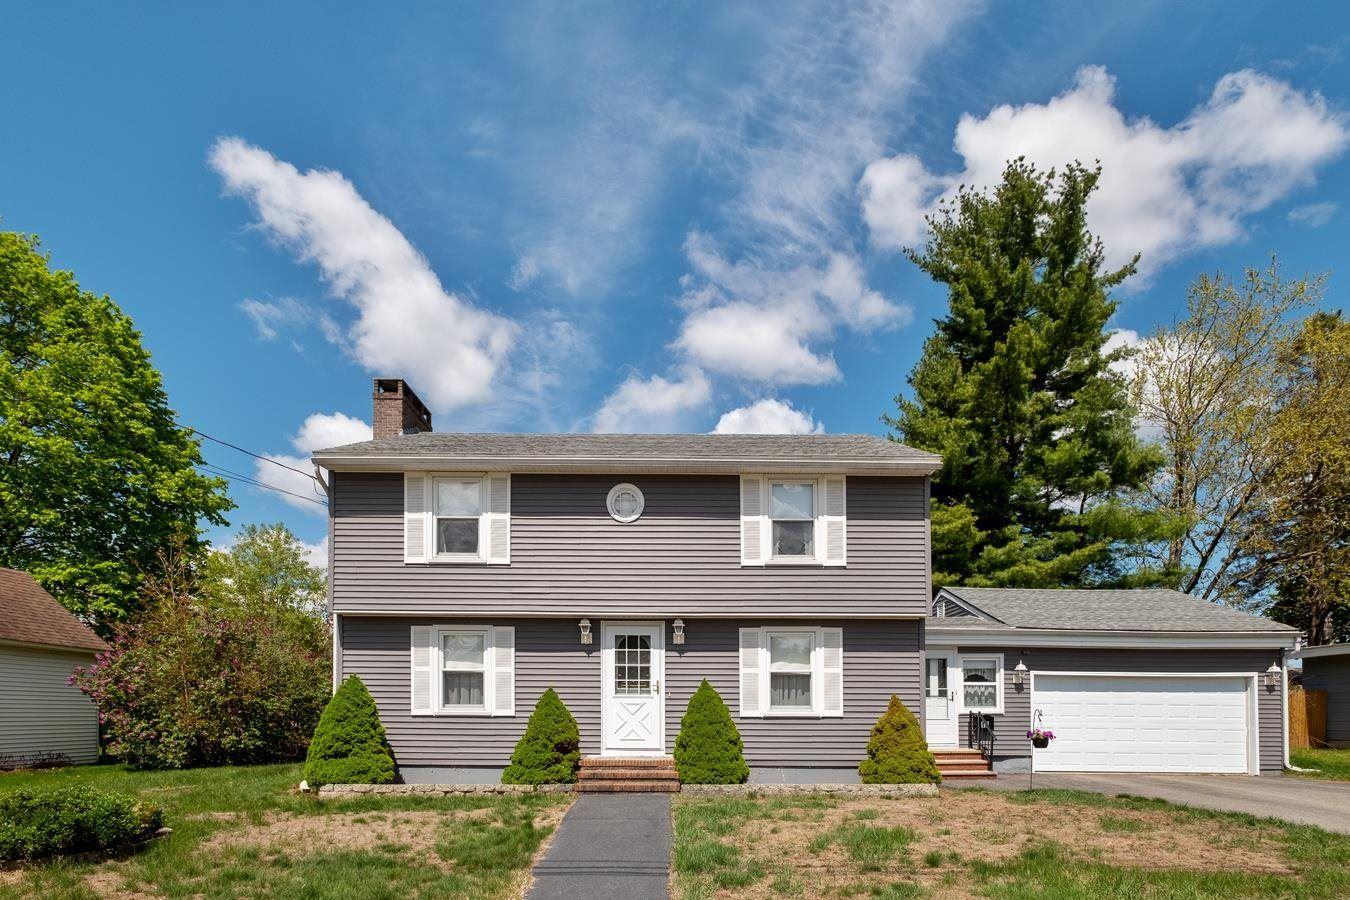 10 Letourneau Street, Rochester, NH 03867 - MLS#: 4860244